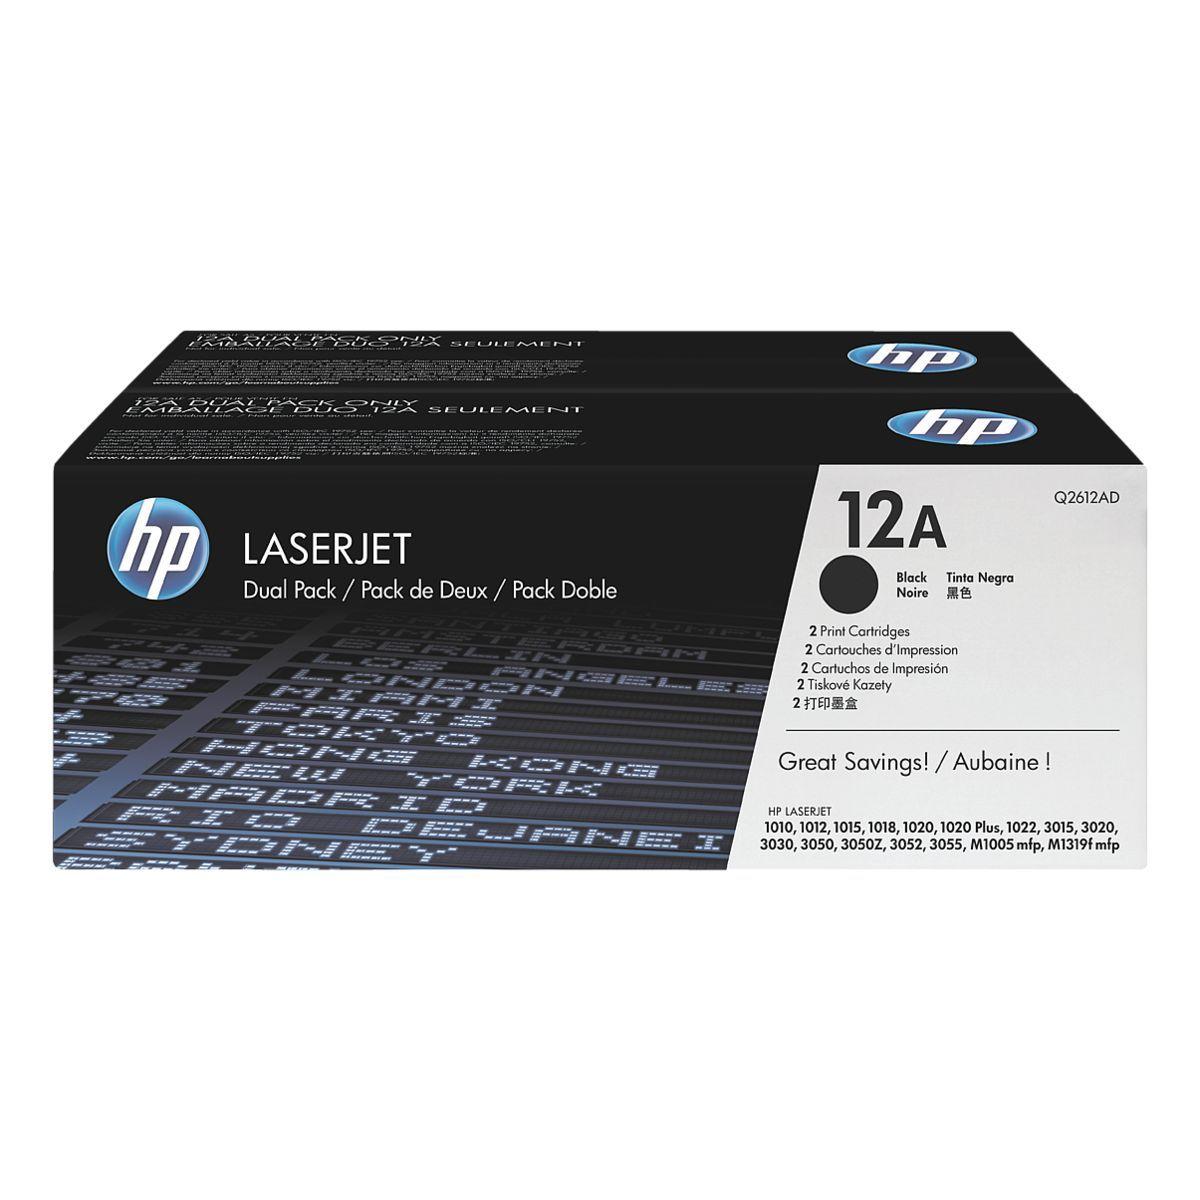 HP 12A LaserJet schwarz (Q2612AD)